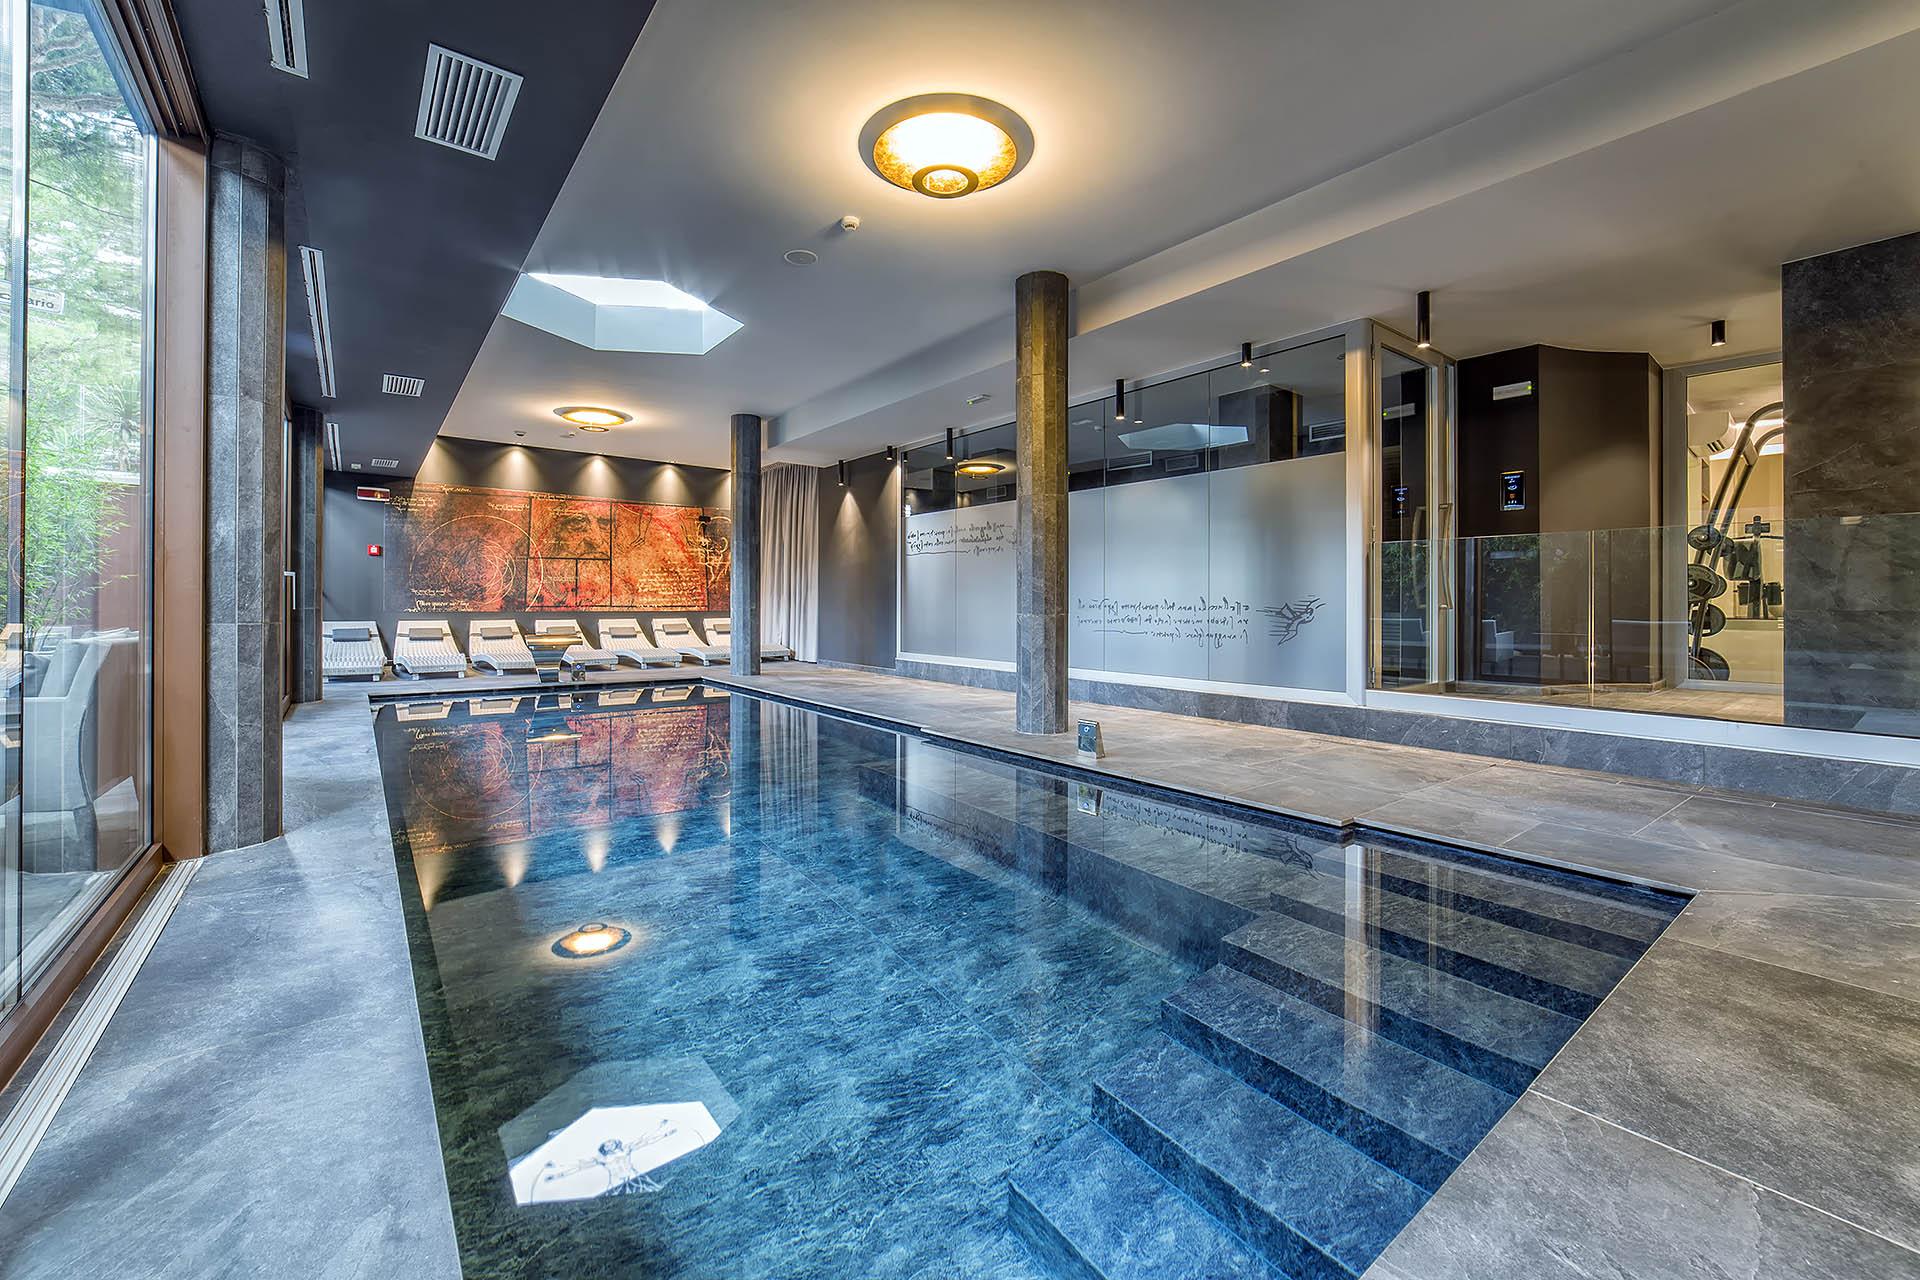 PISCINA ADULTI<br /> HOTEL LEONARDO DA VINCI - BIBIONE (VE)